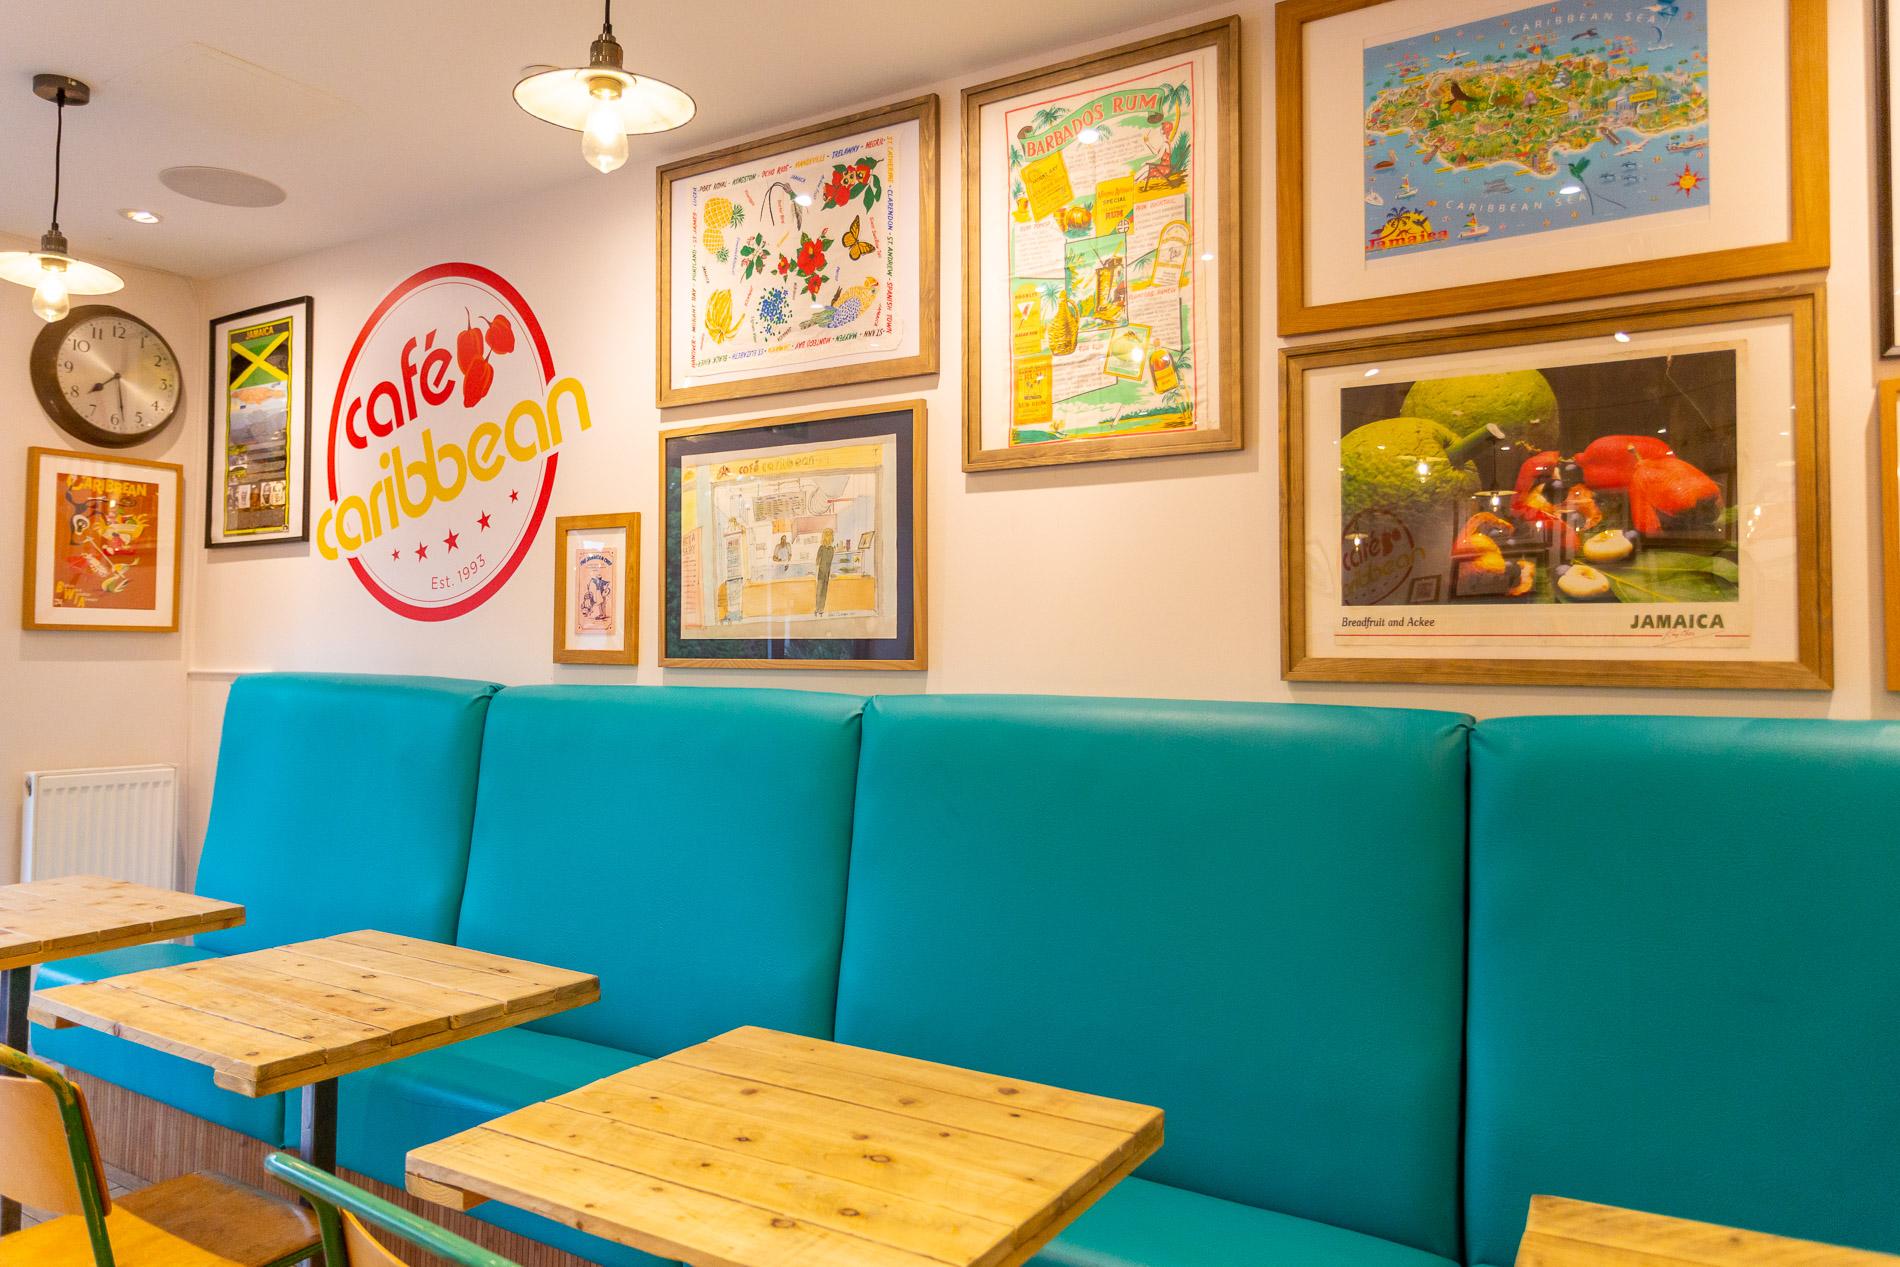 Cafe Caribbean Restaurant Loughton